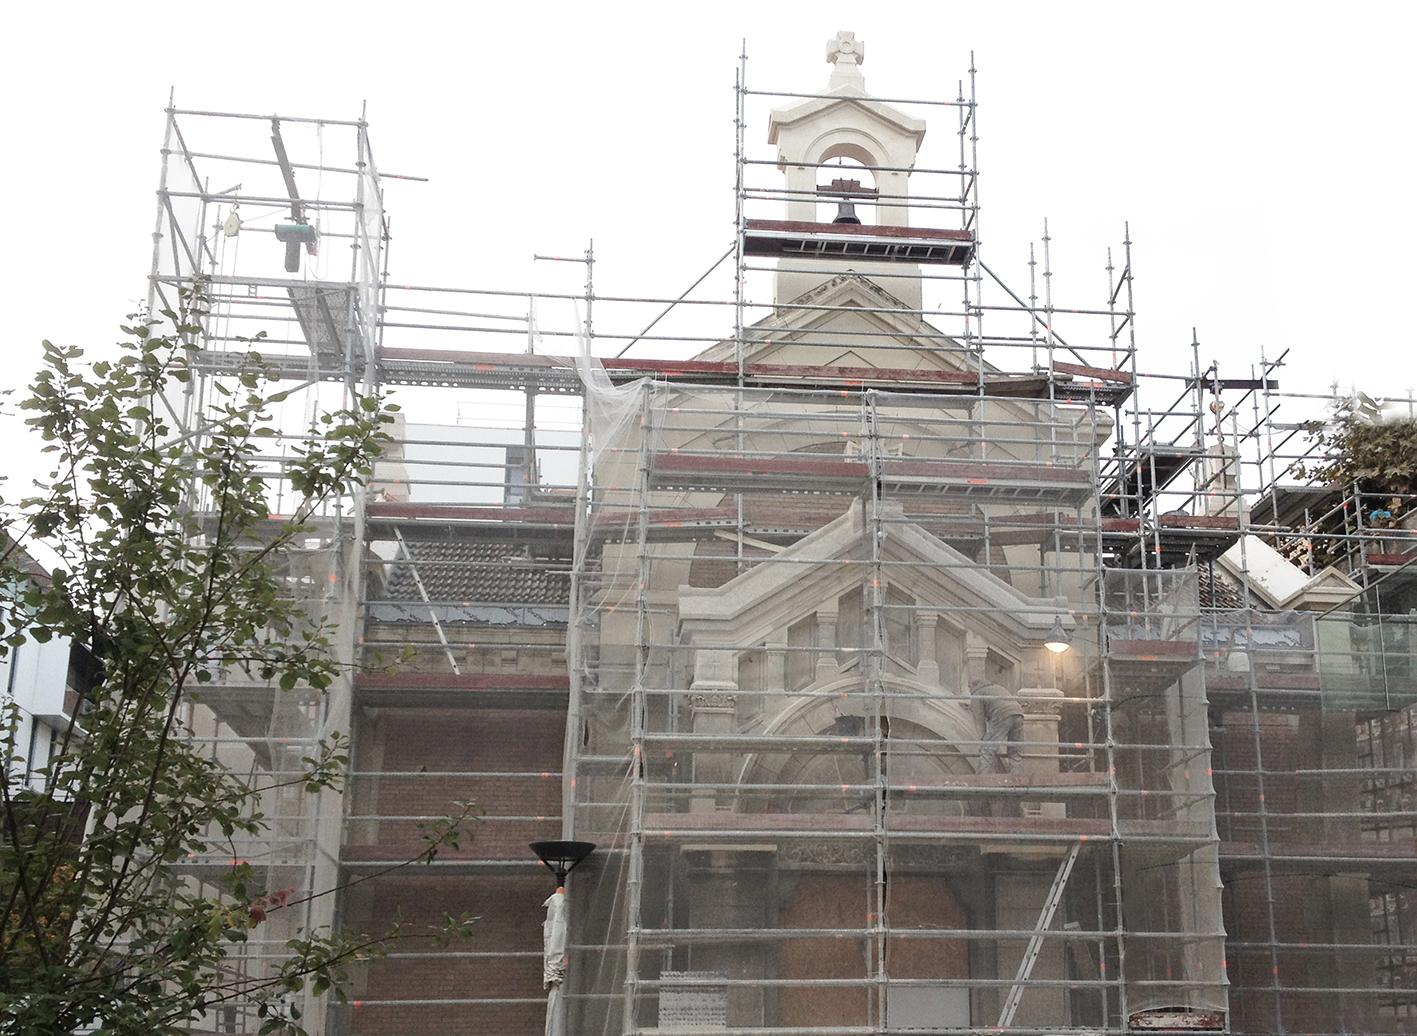 2-Nettoyages de la facade en cours